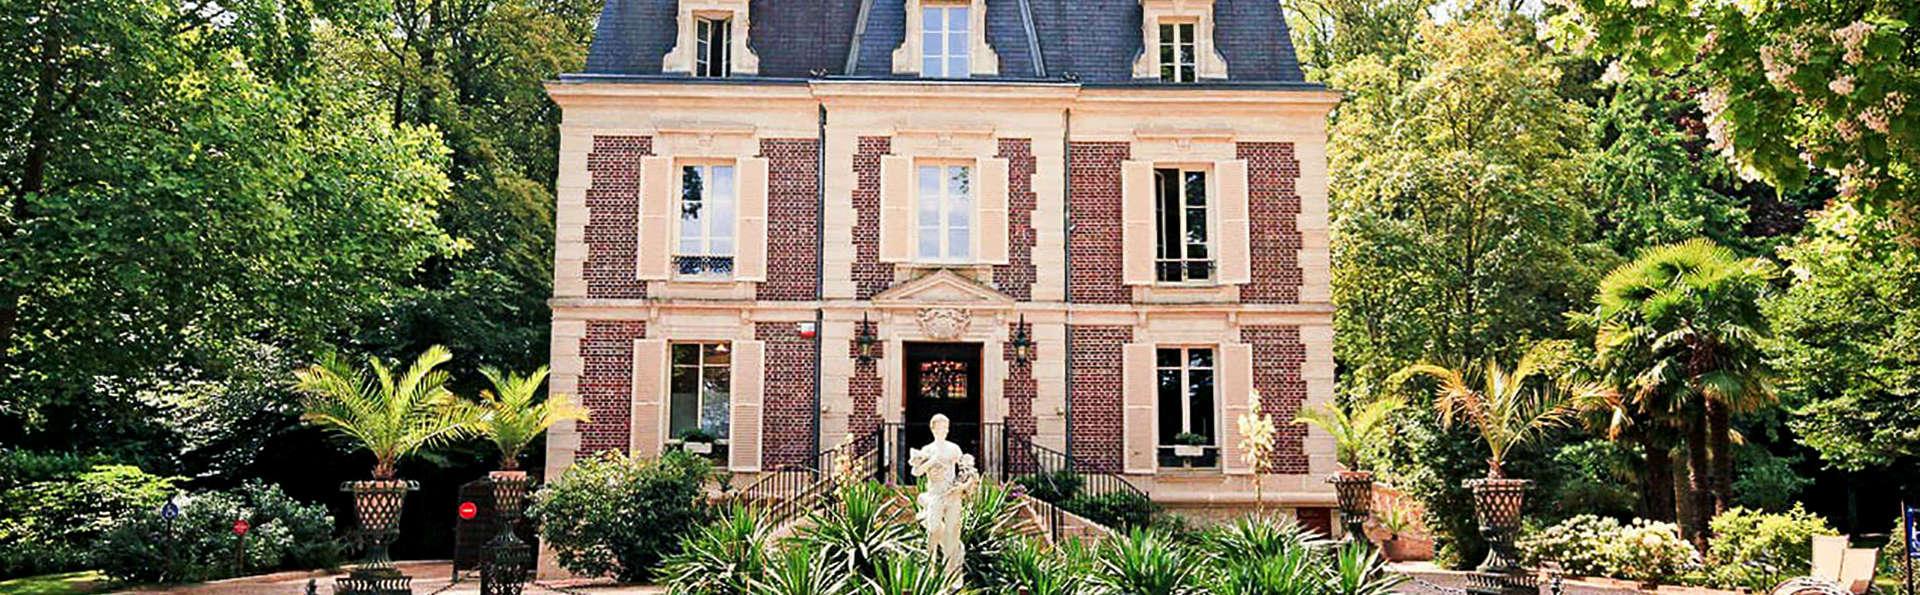 les jardins dpicure edit_new_frontjpg - Jardin D Epicure